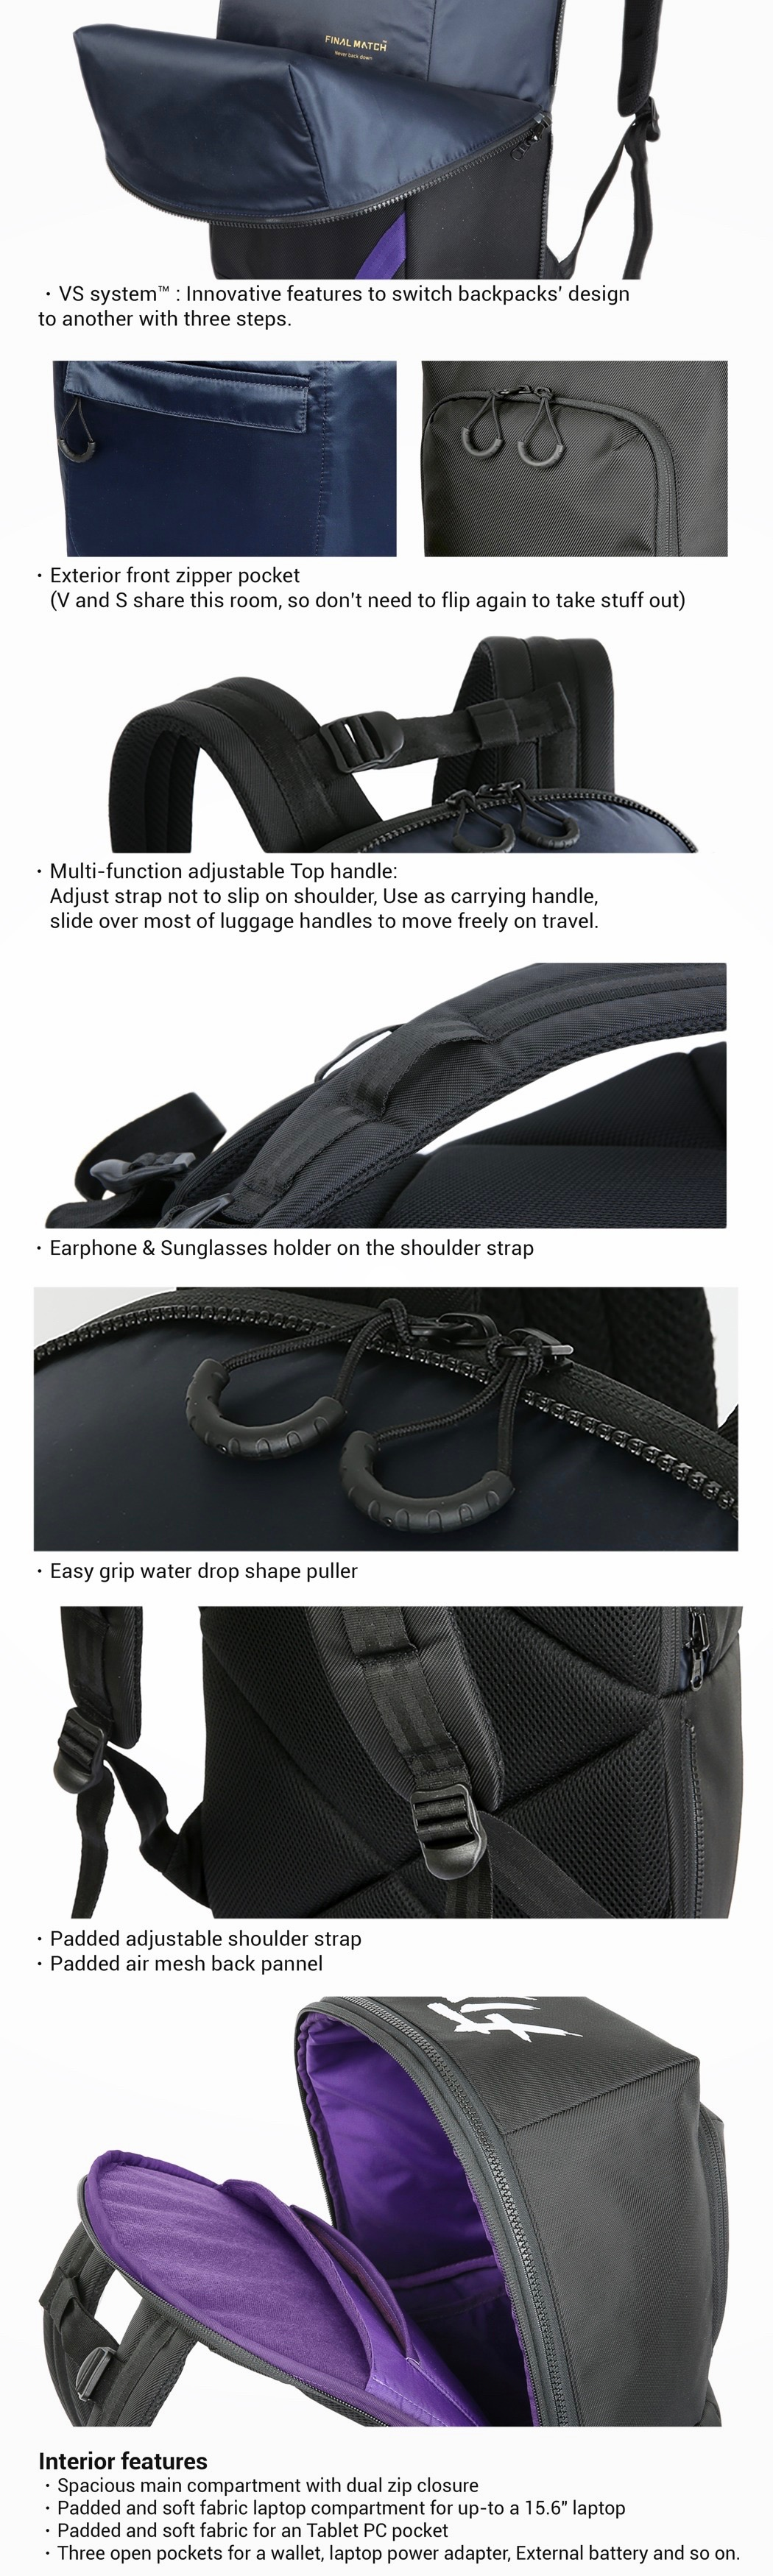 vs_convertible_backpack_07